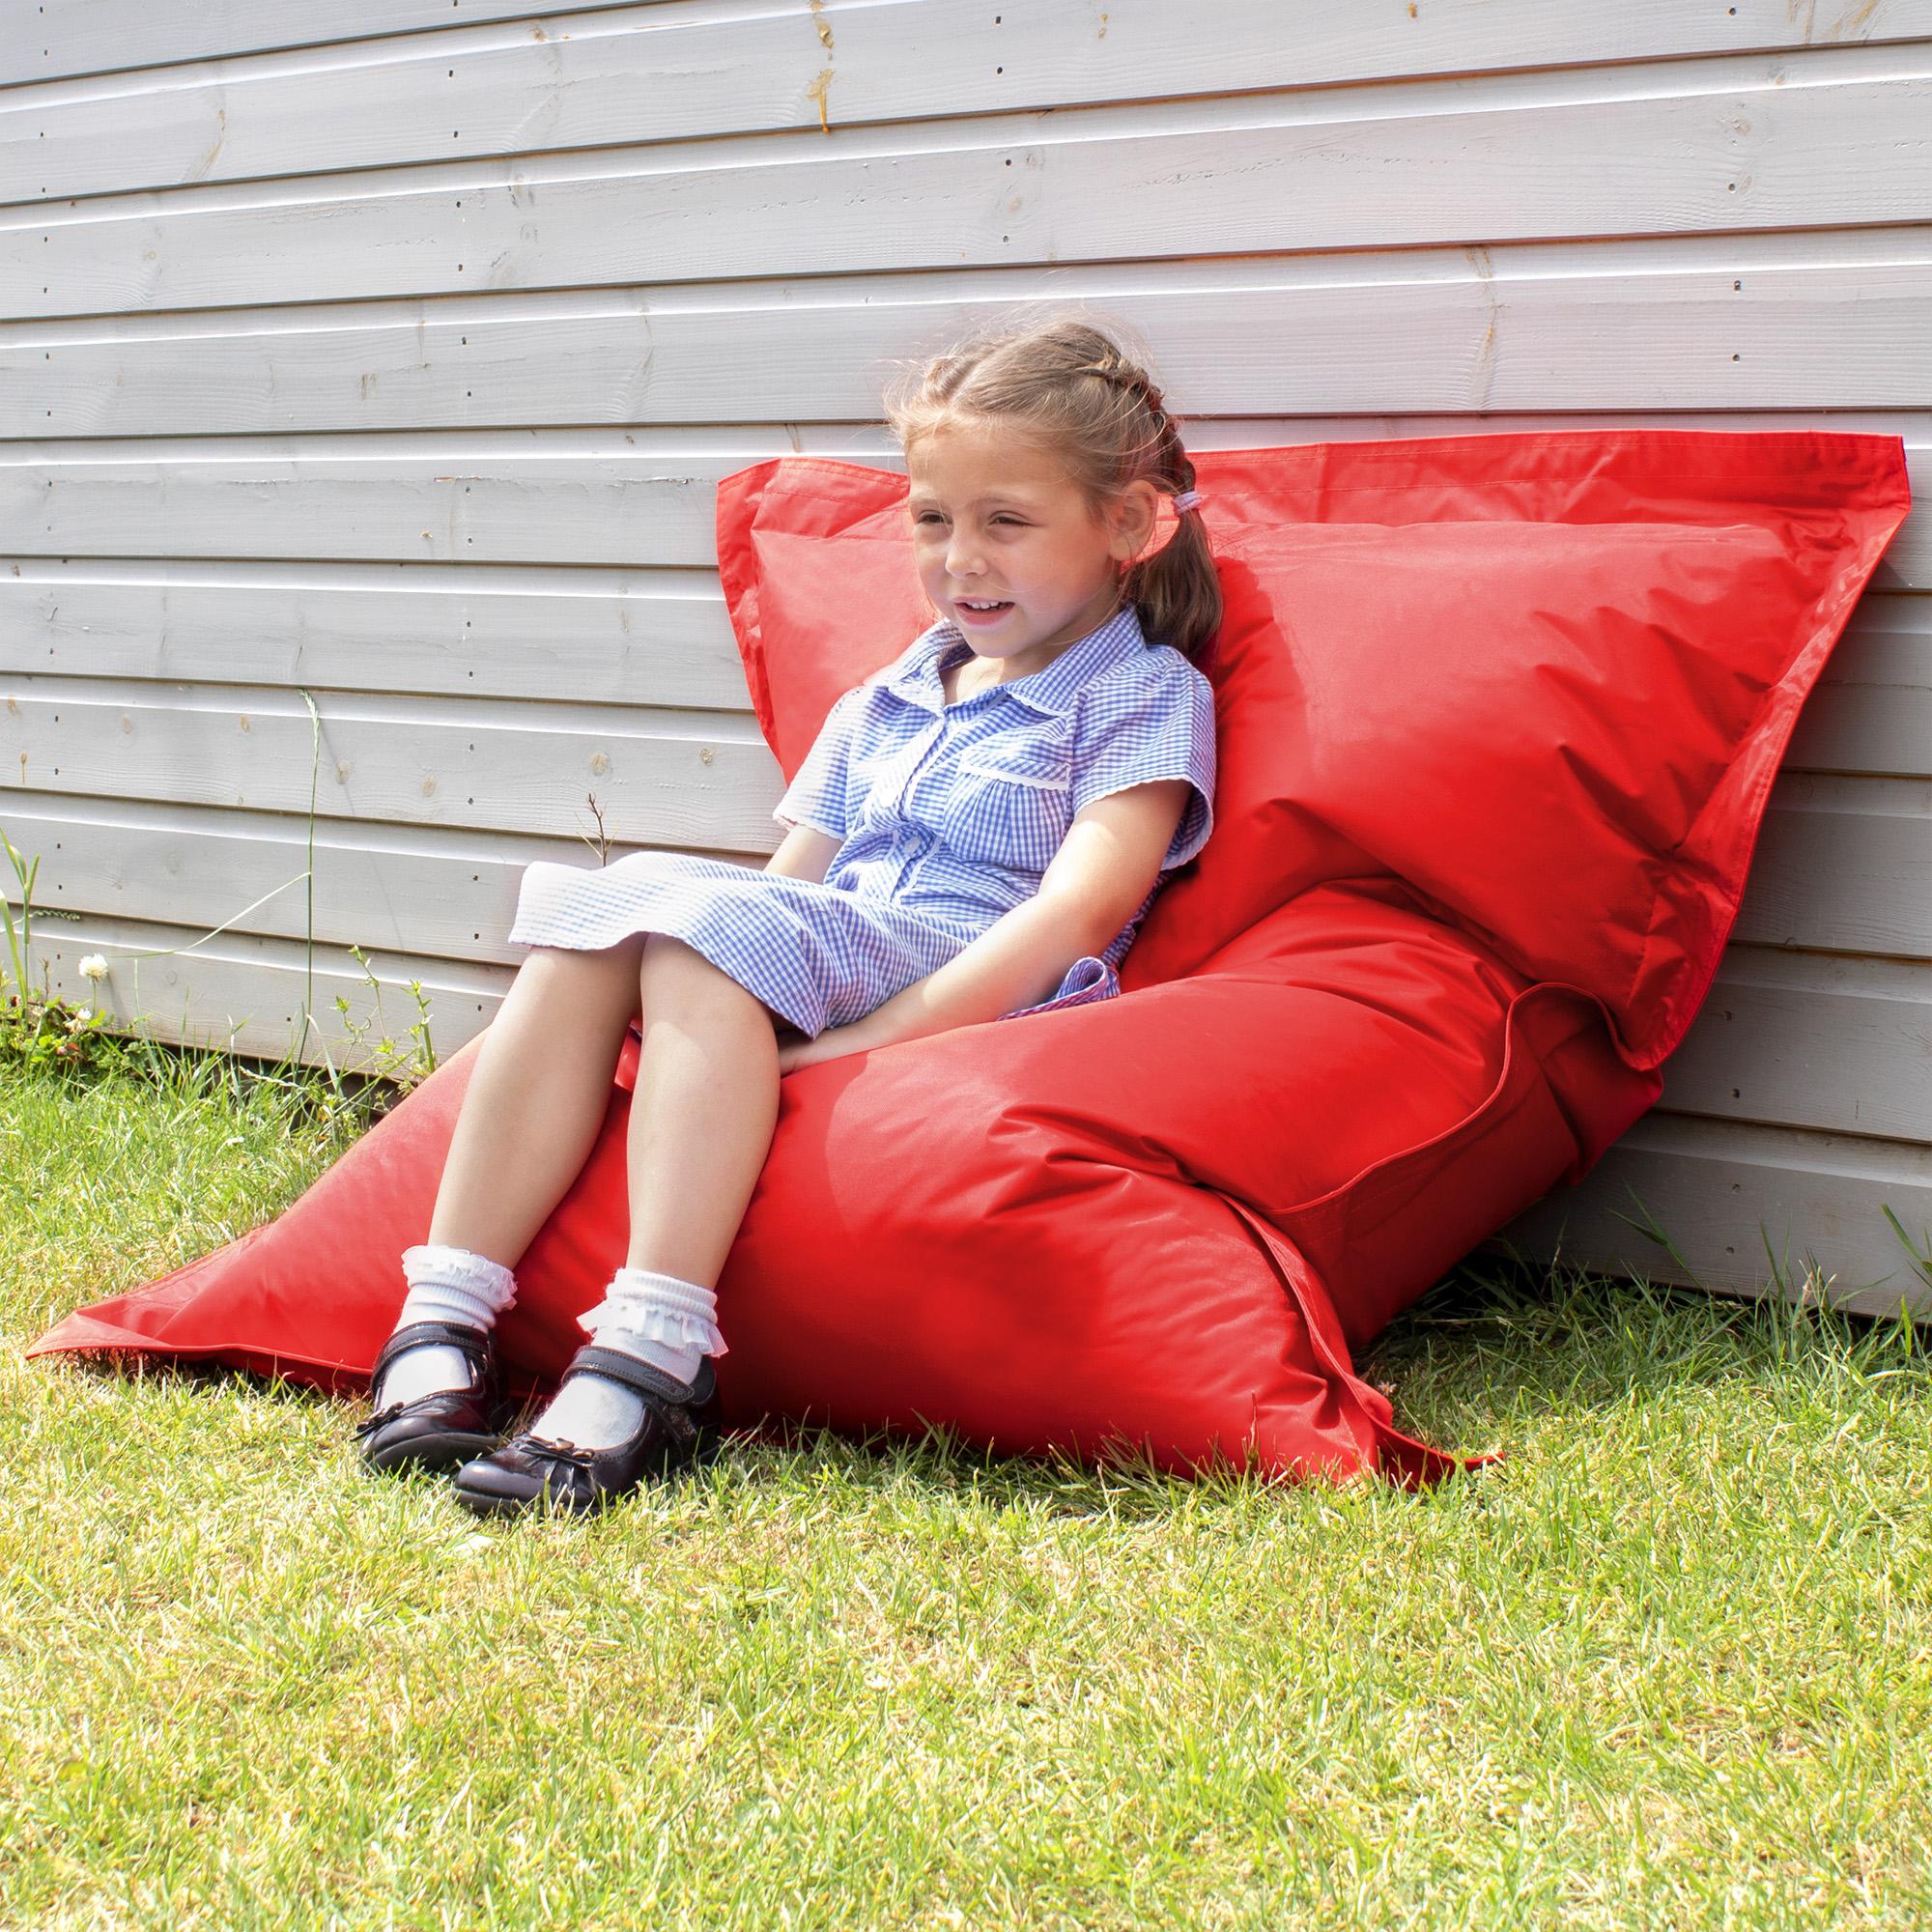 Eden-Childrens-Giant-Cushion-red-LF-300dpi-1